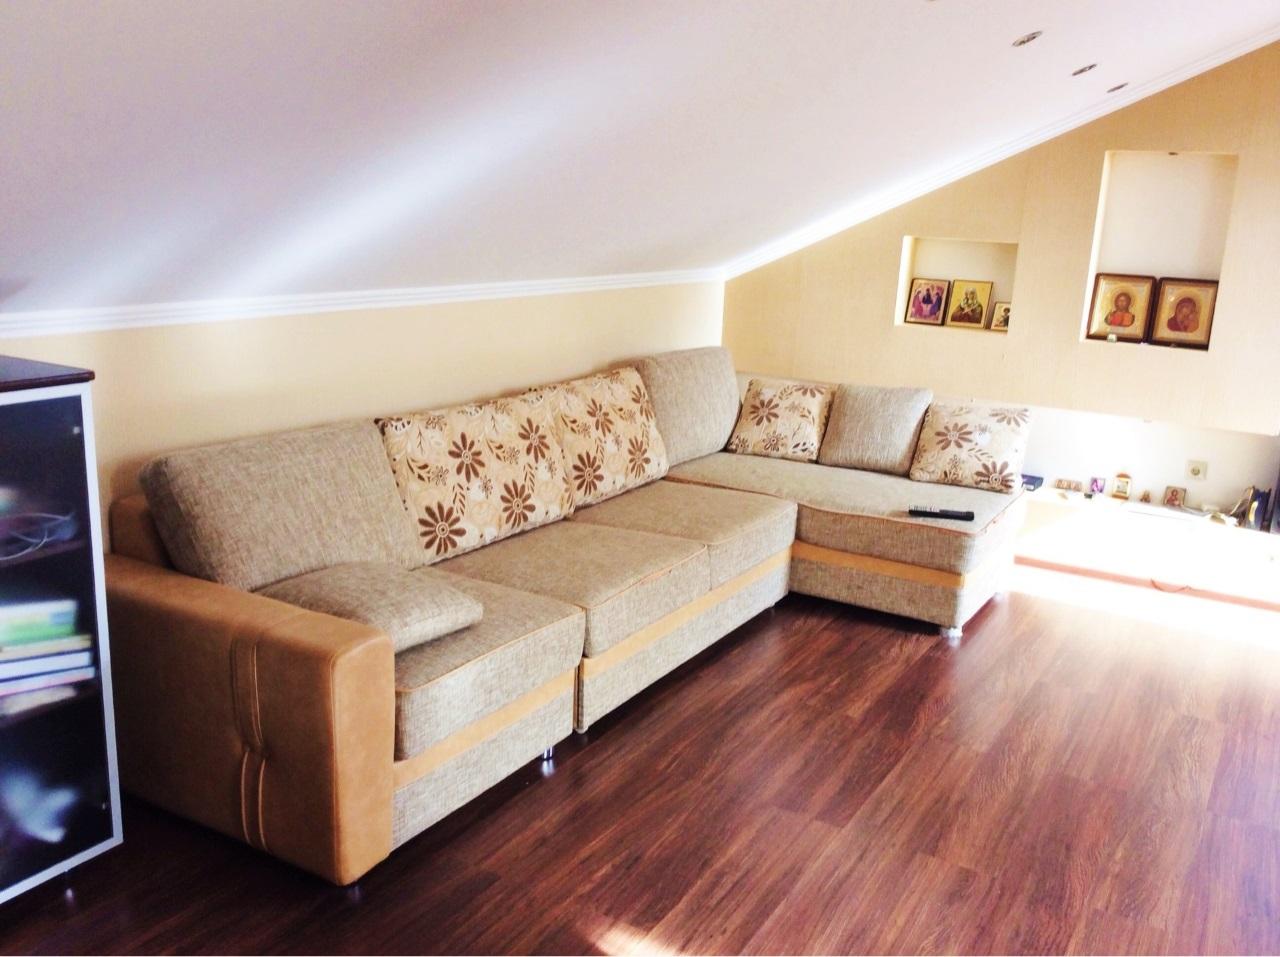 На втором уровне угловой диван